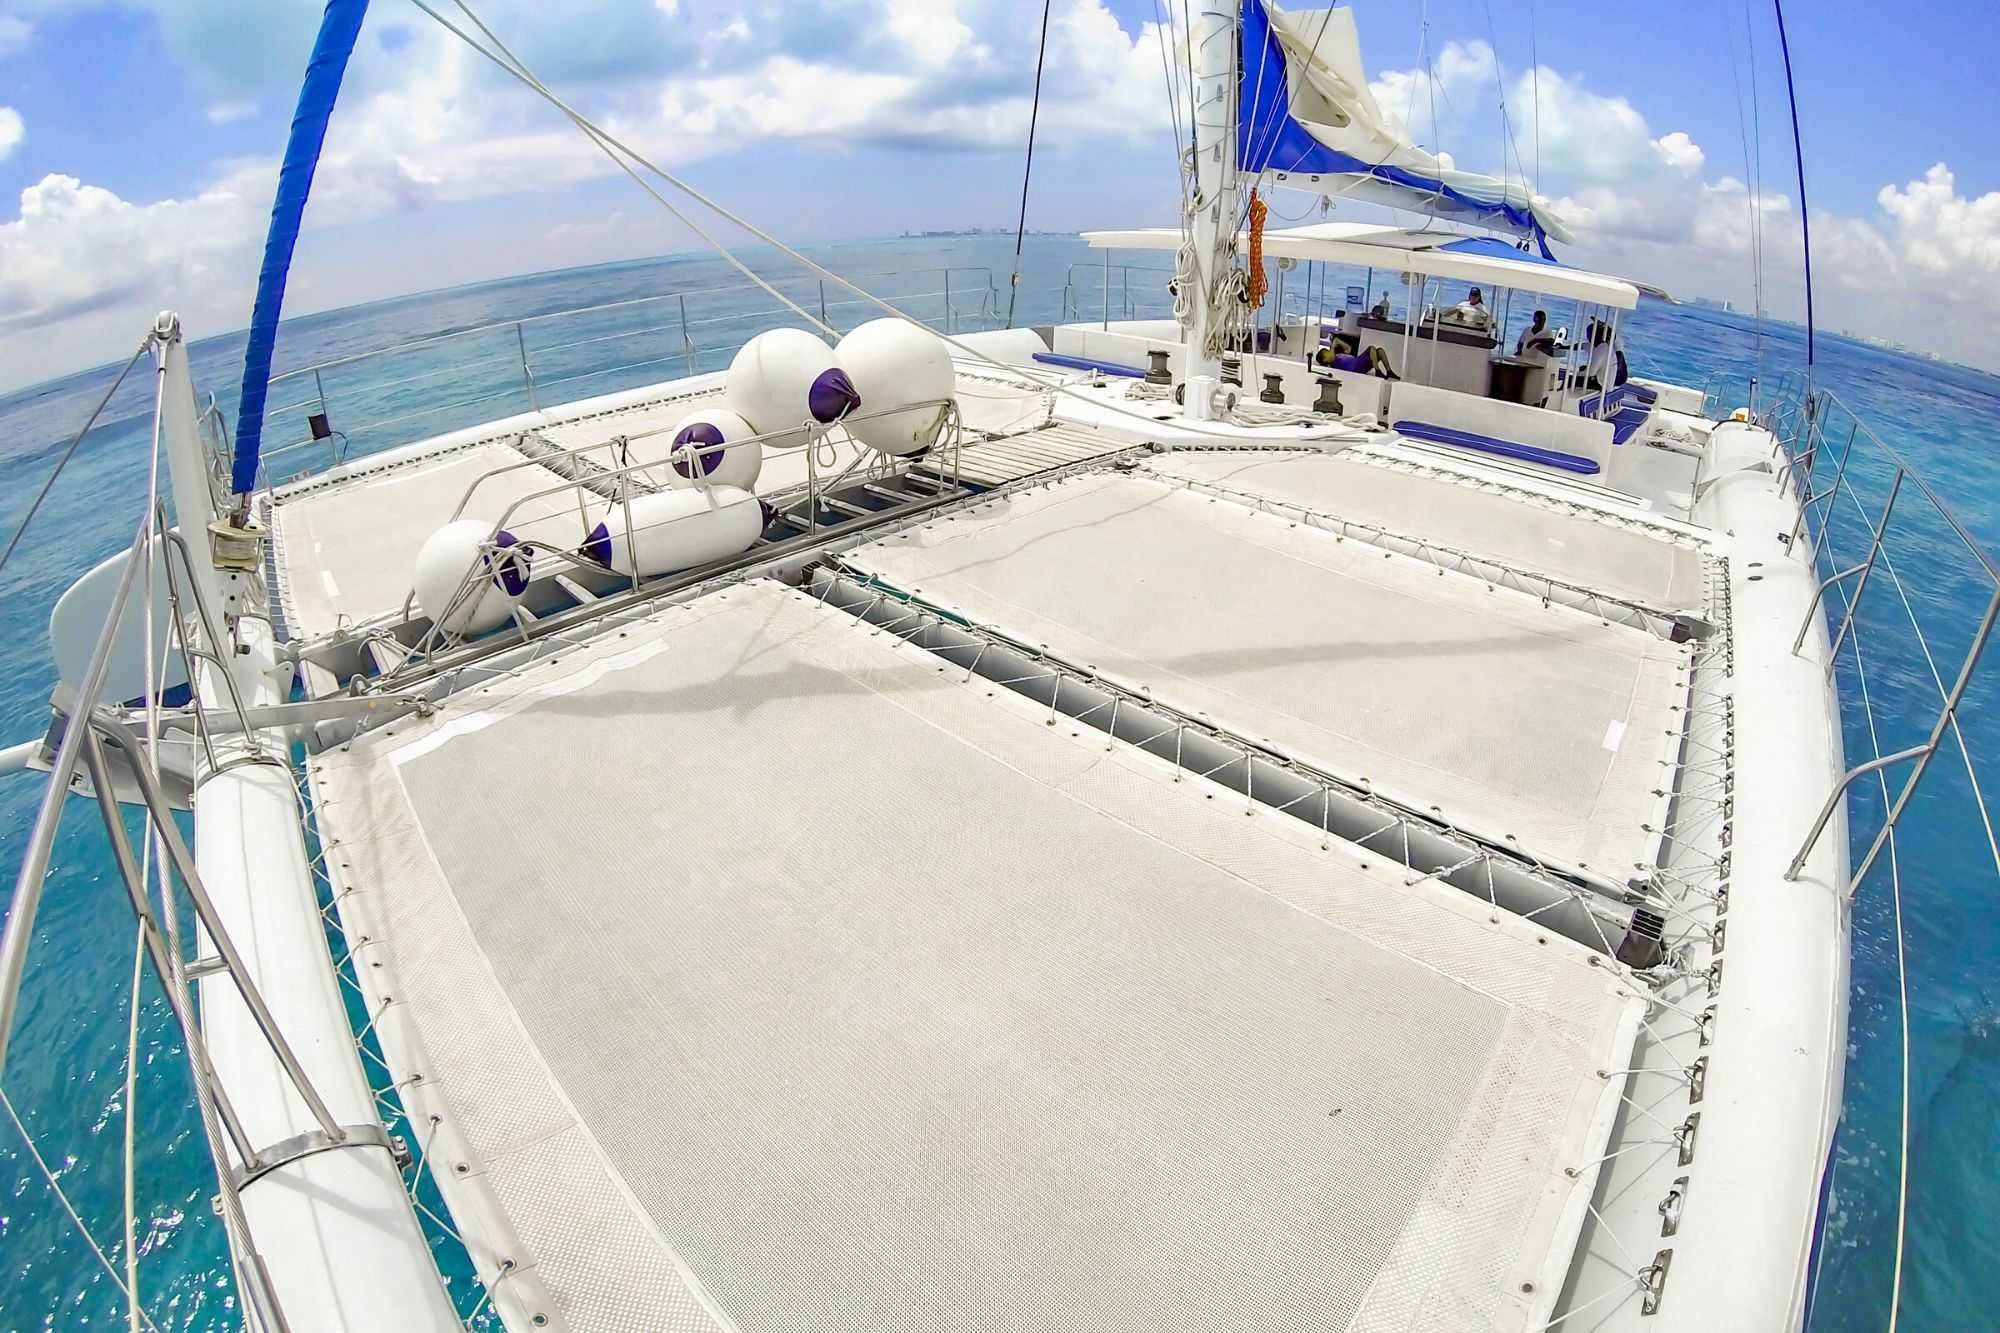 9 Private Isla Mujeres tour in catamaran - Sea Passion I II - Cancun Sailing